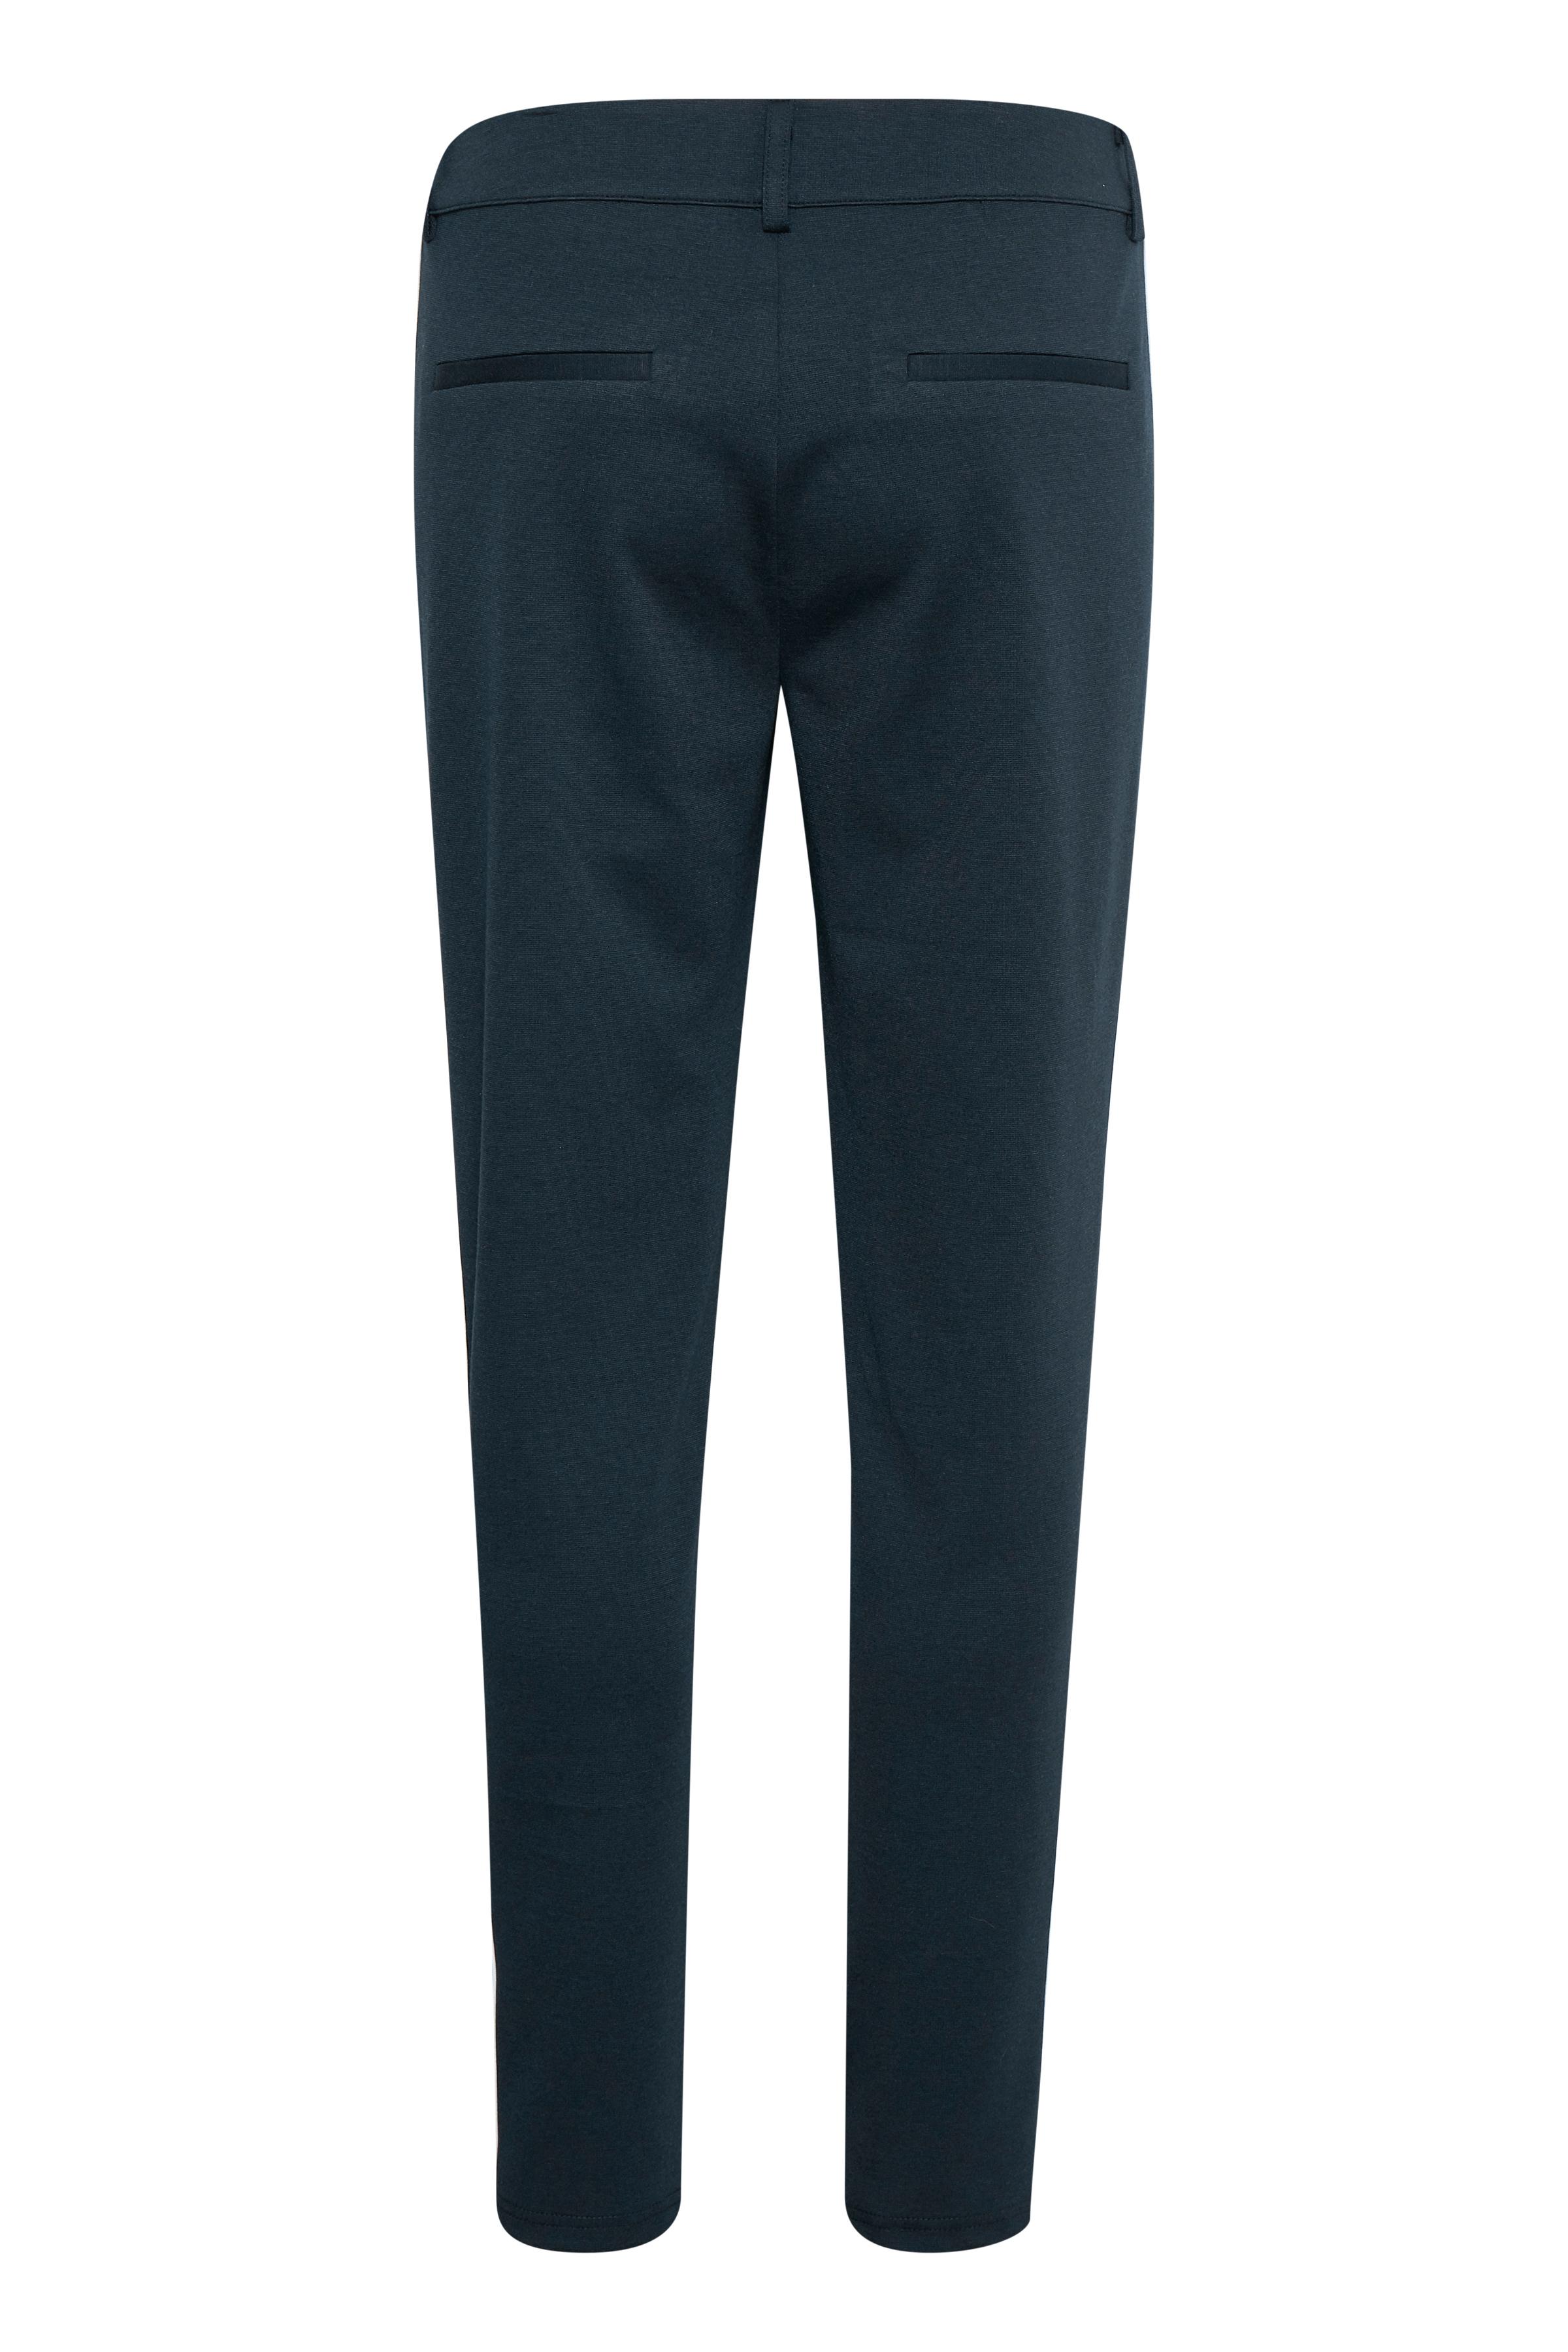 Marineblau Casual Hose von Bon'A Parte – Shoppen Sie Marineblau Casual Hose ab Gr. 36-48 hier